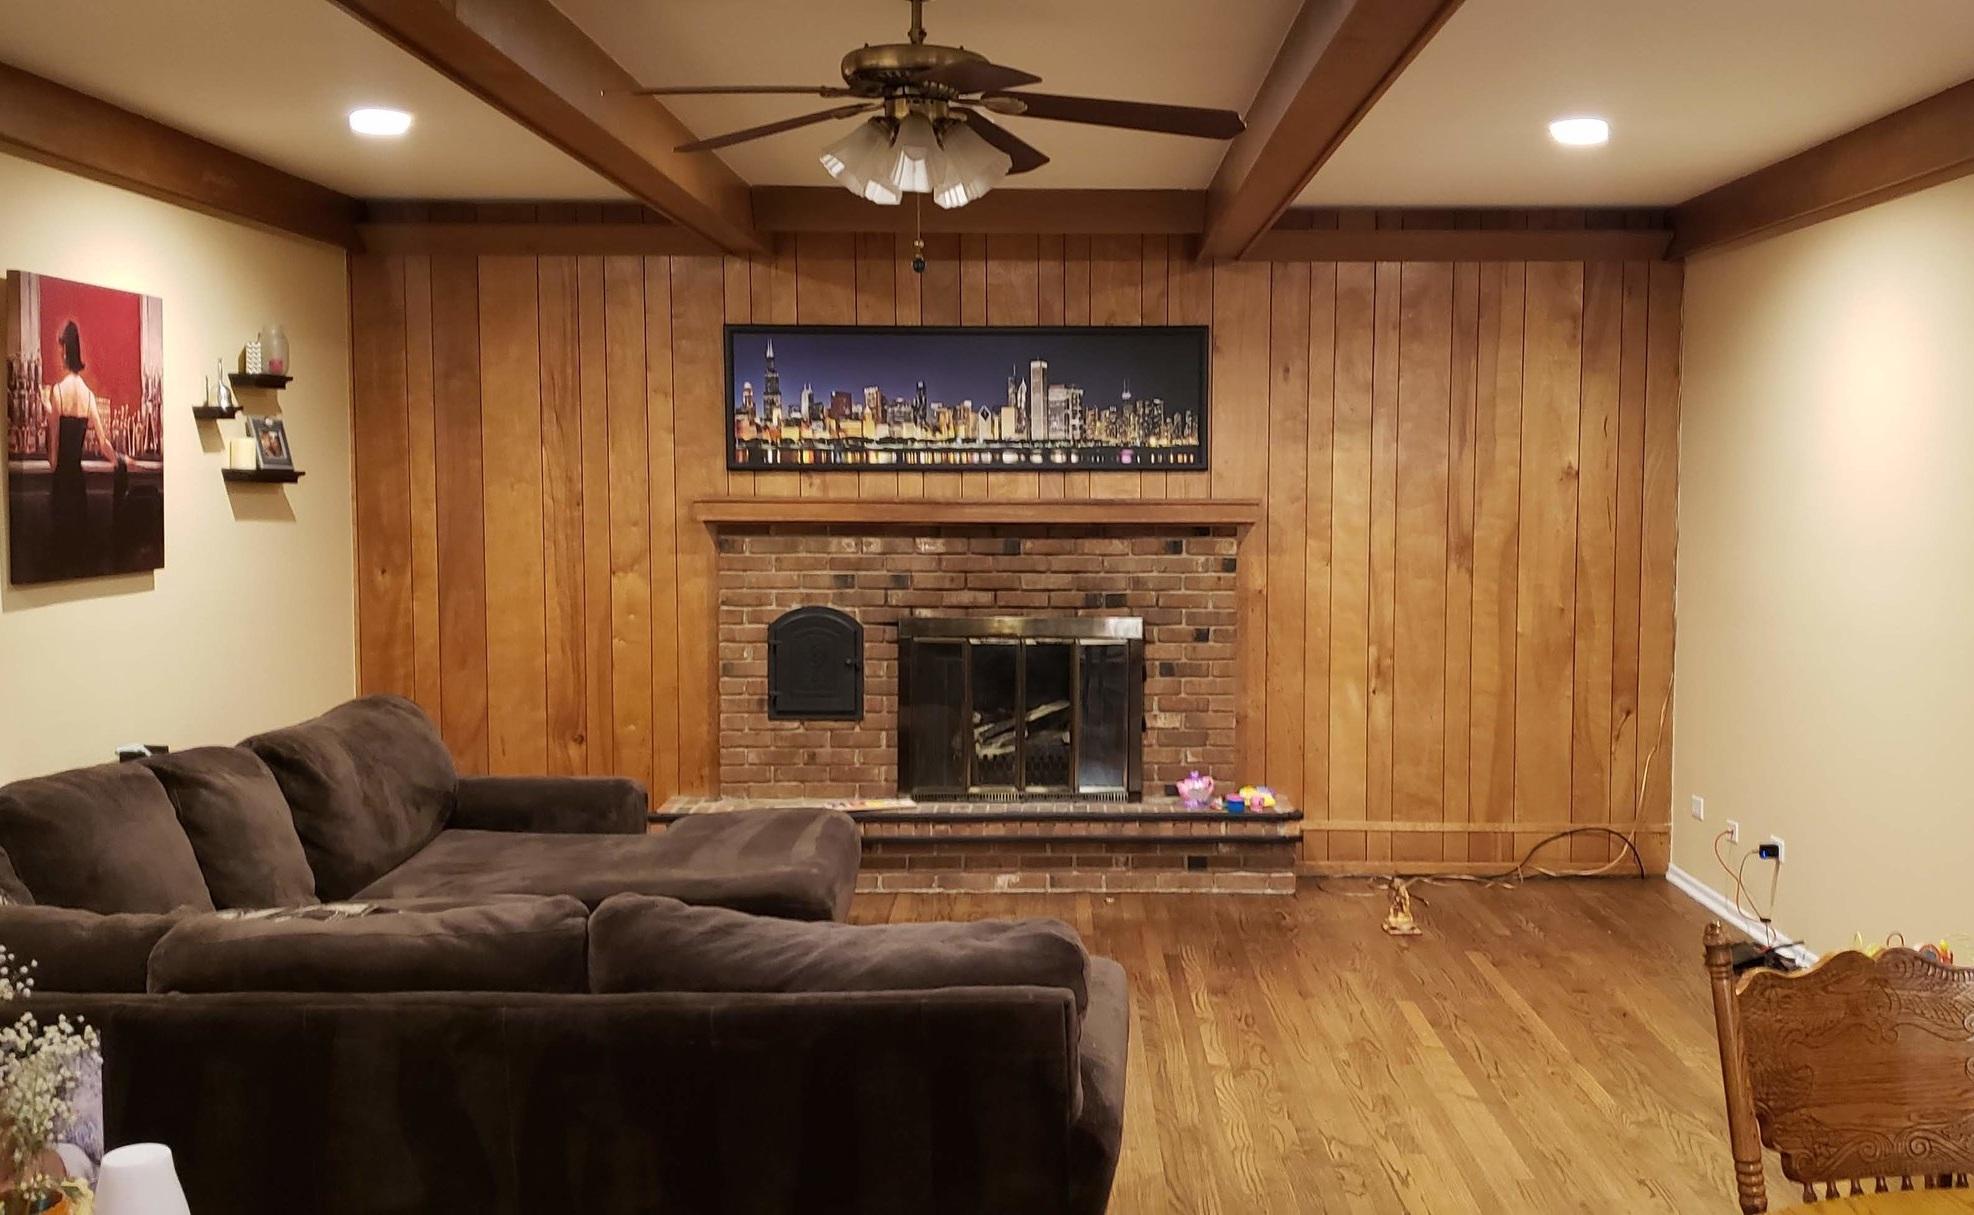 DIY Family Room Makeover | DIY Shiplap | Budget Fireplace Renovation